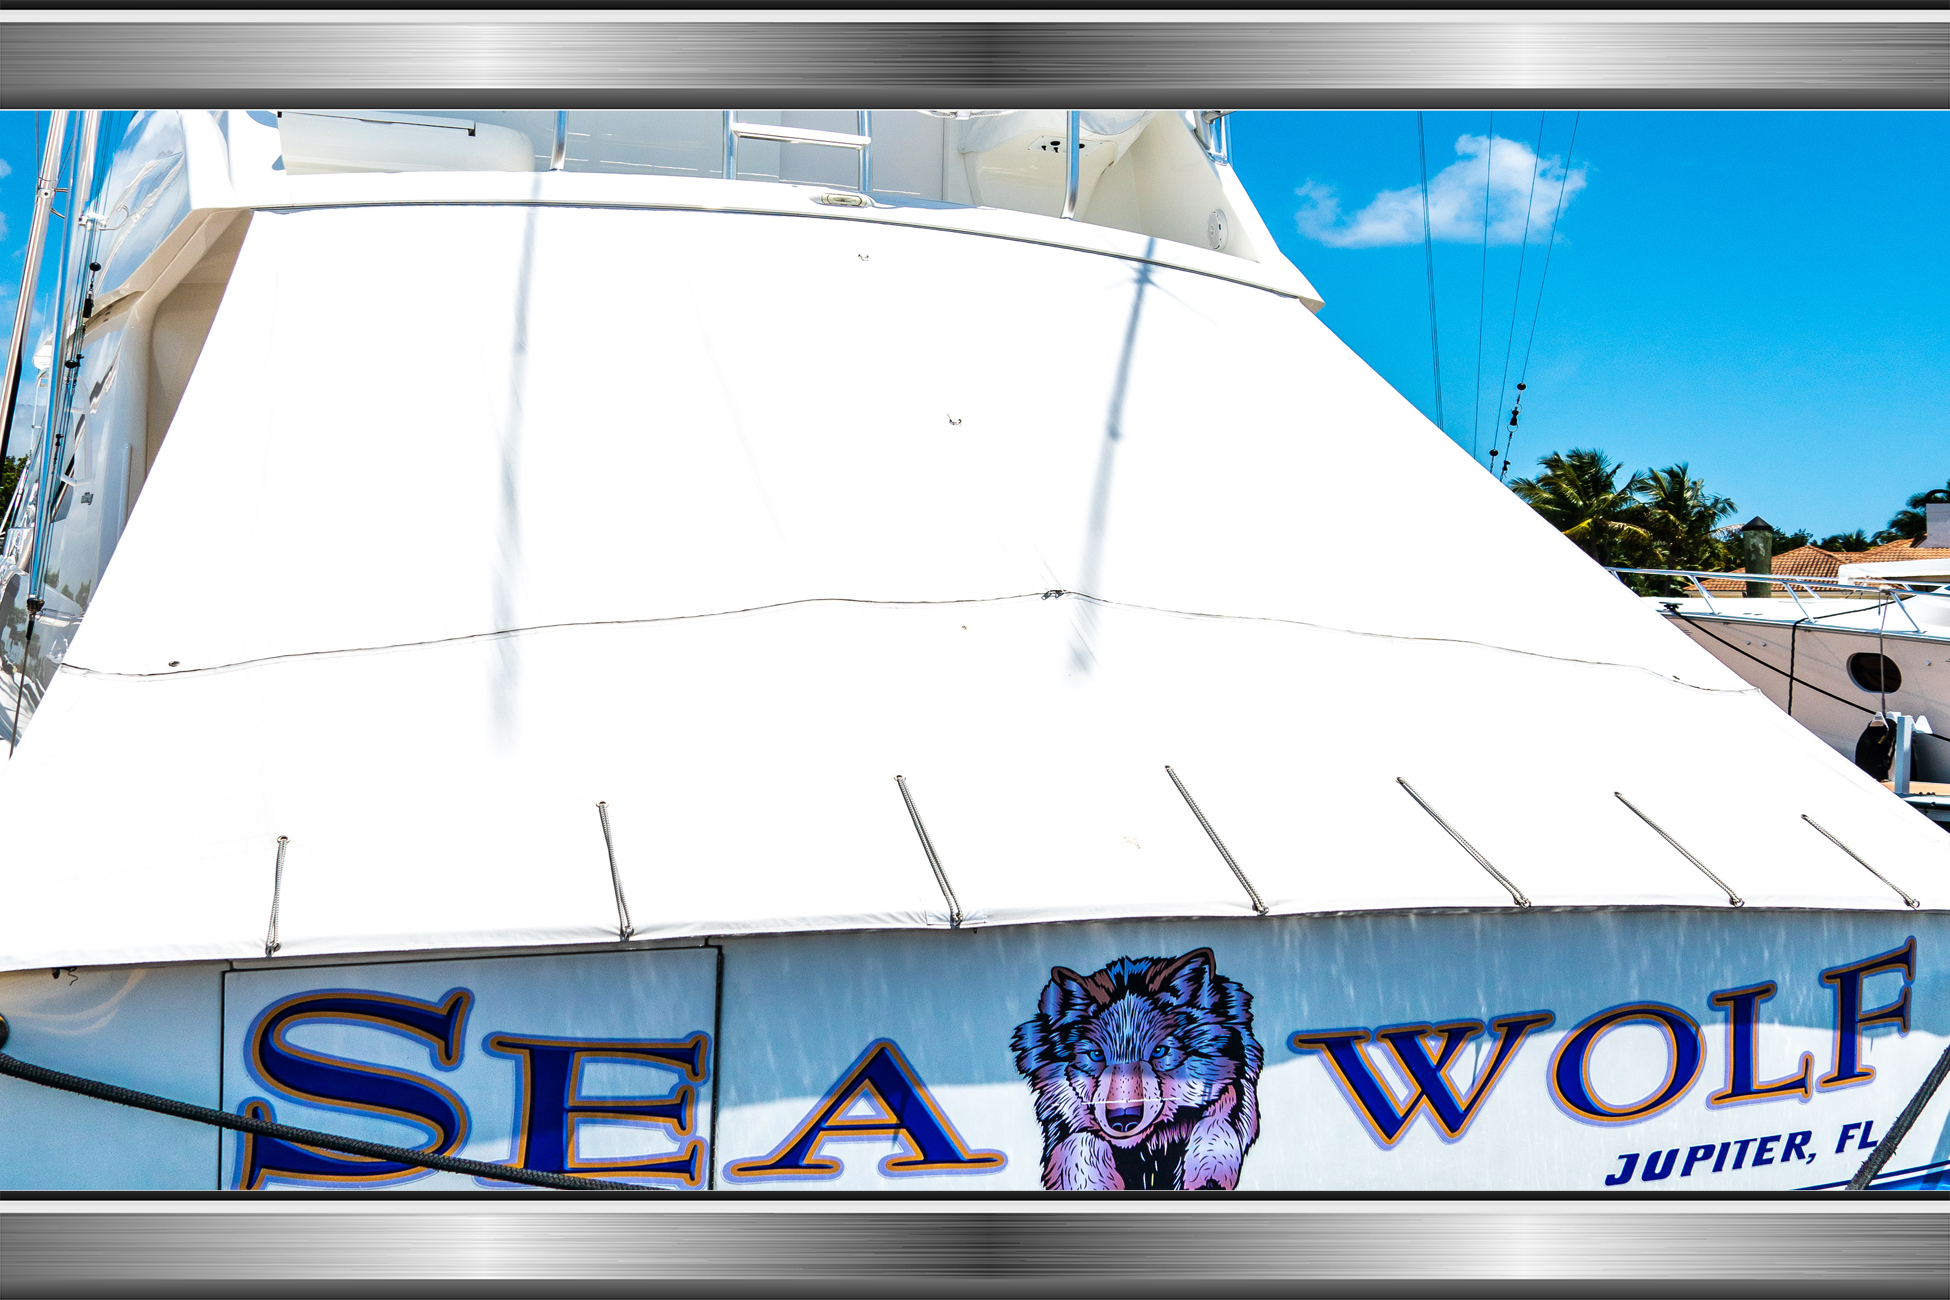 SEA WOLF_REV LAYERS LARGE_1.jpg